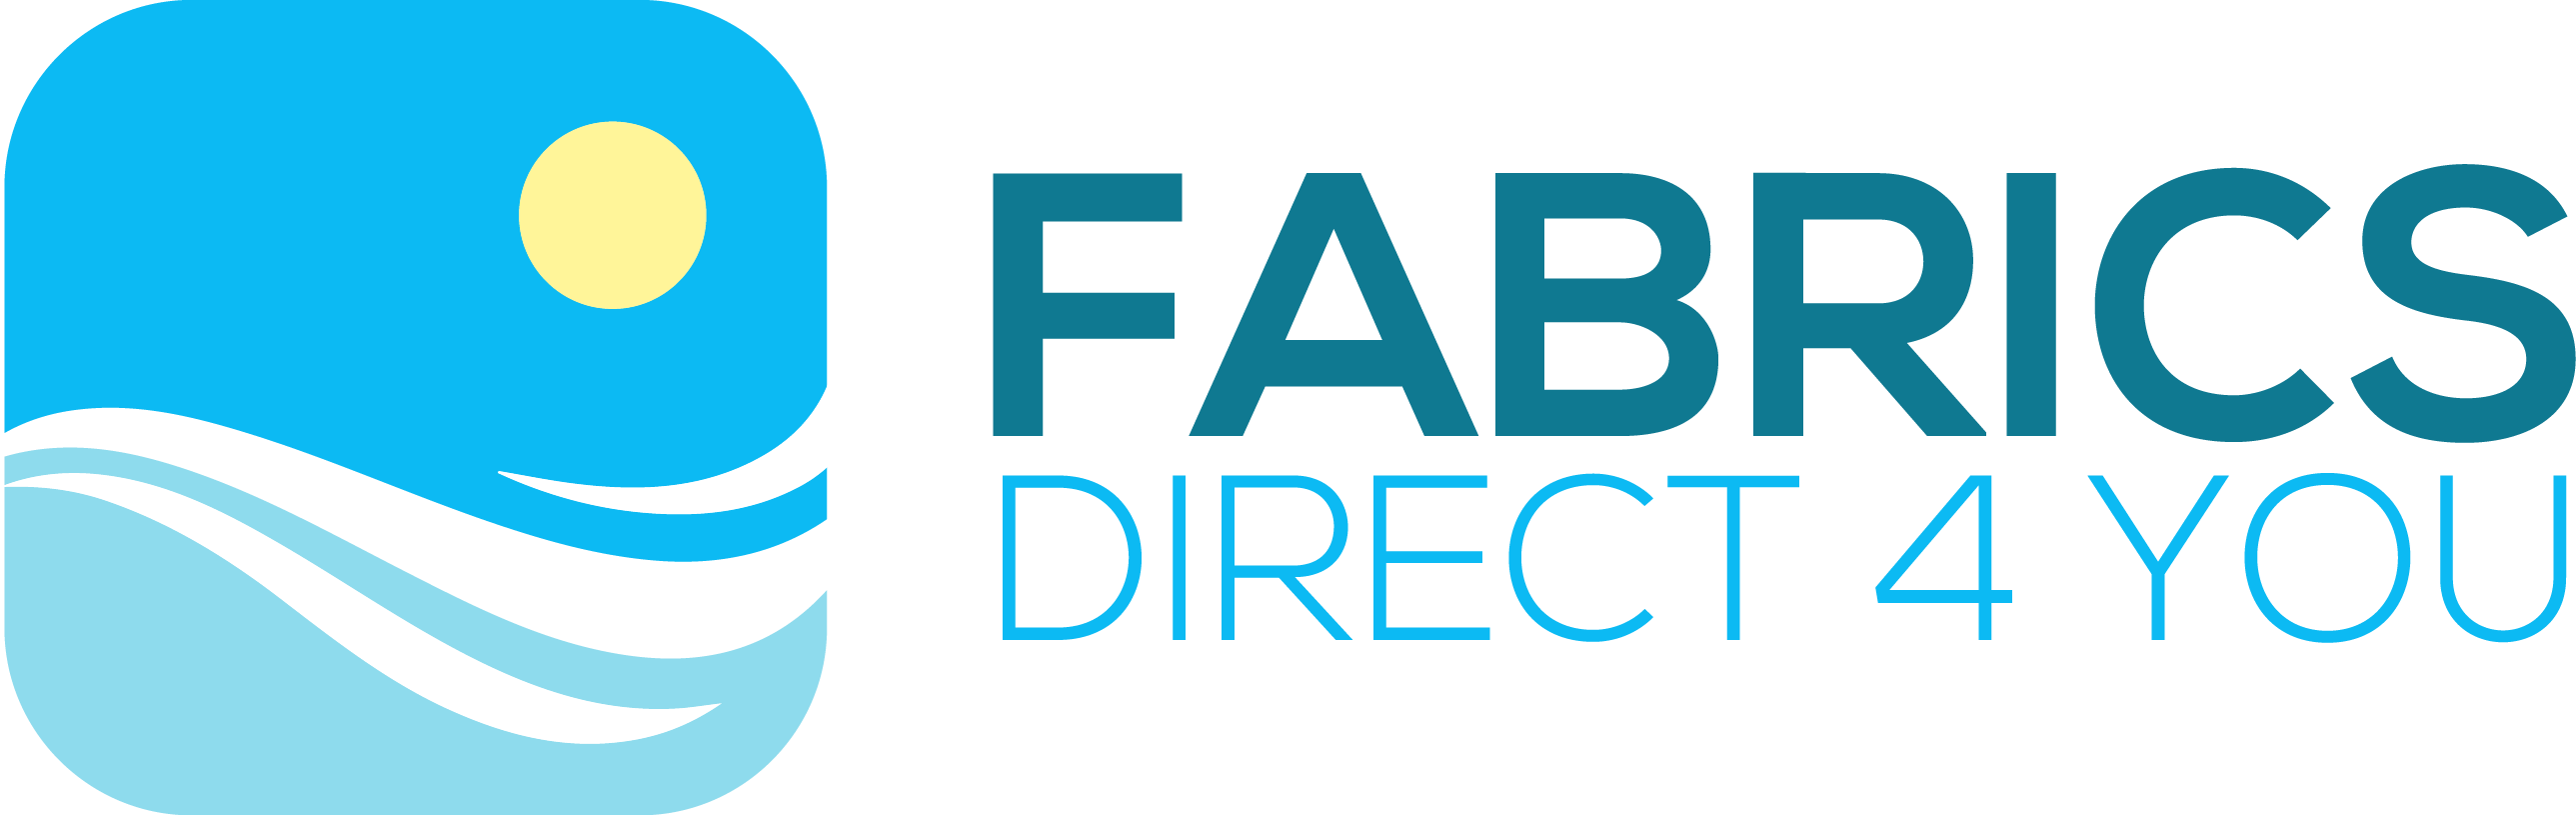 Fabrics Direct 4 You